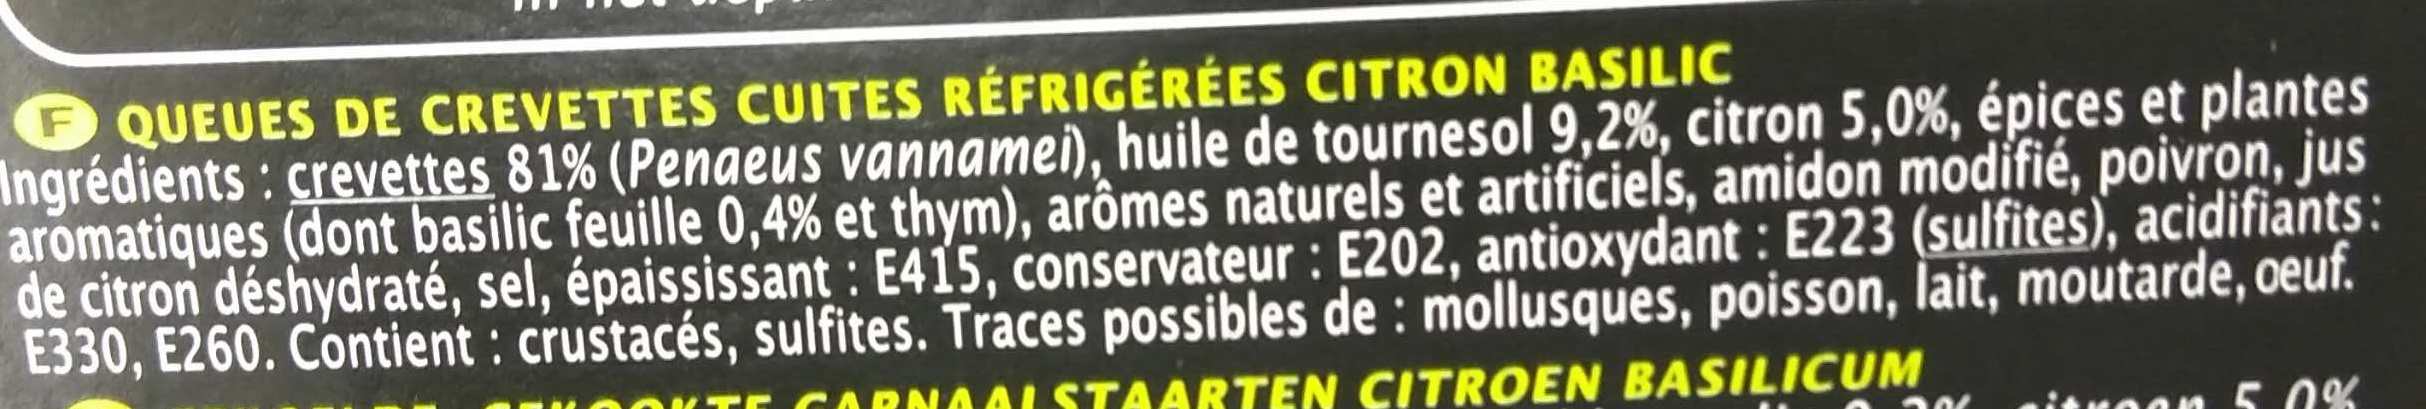 Queues de Crevettes Marinées Citron Basilic - Ingrediënten - fr